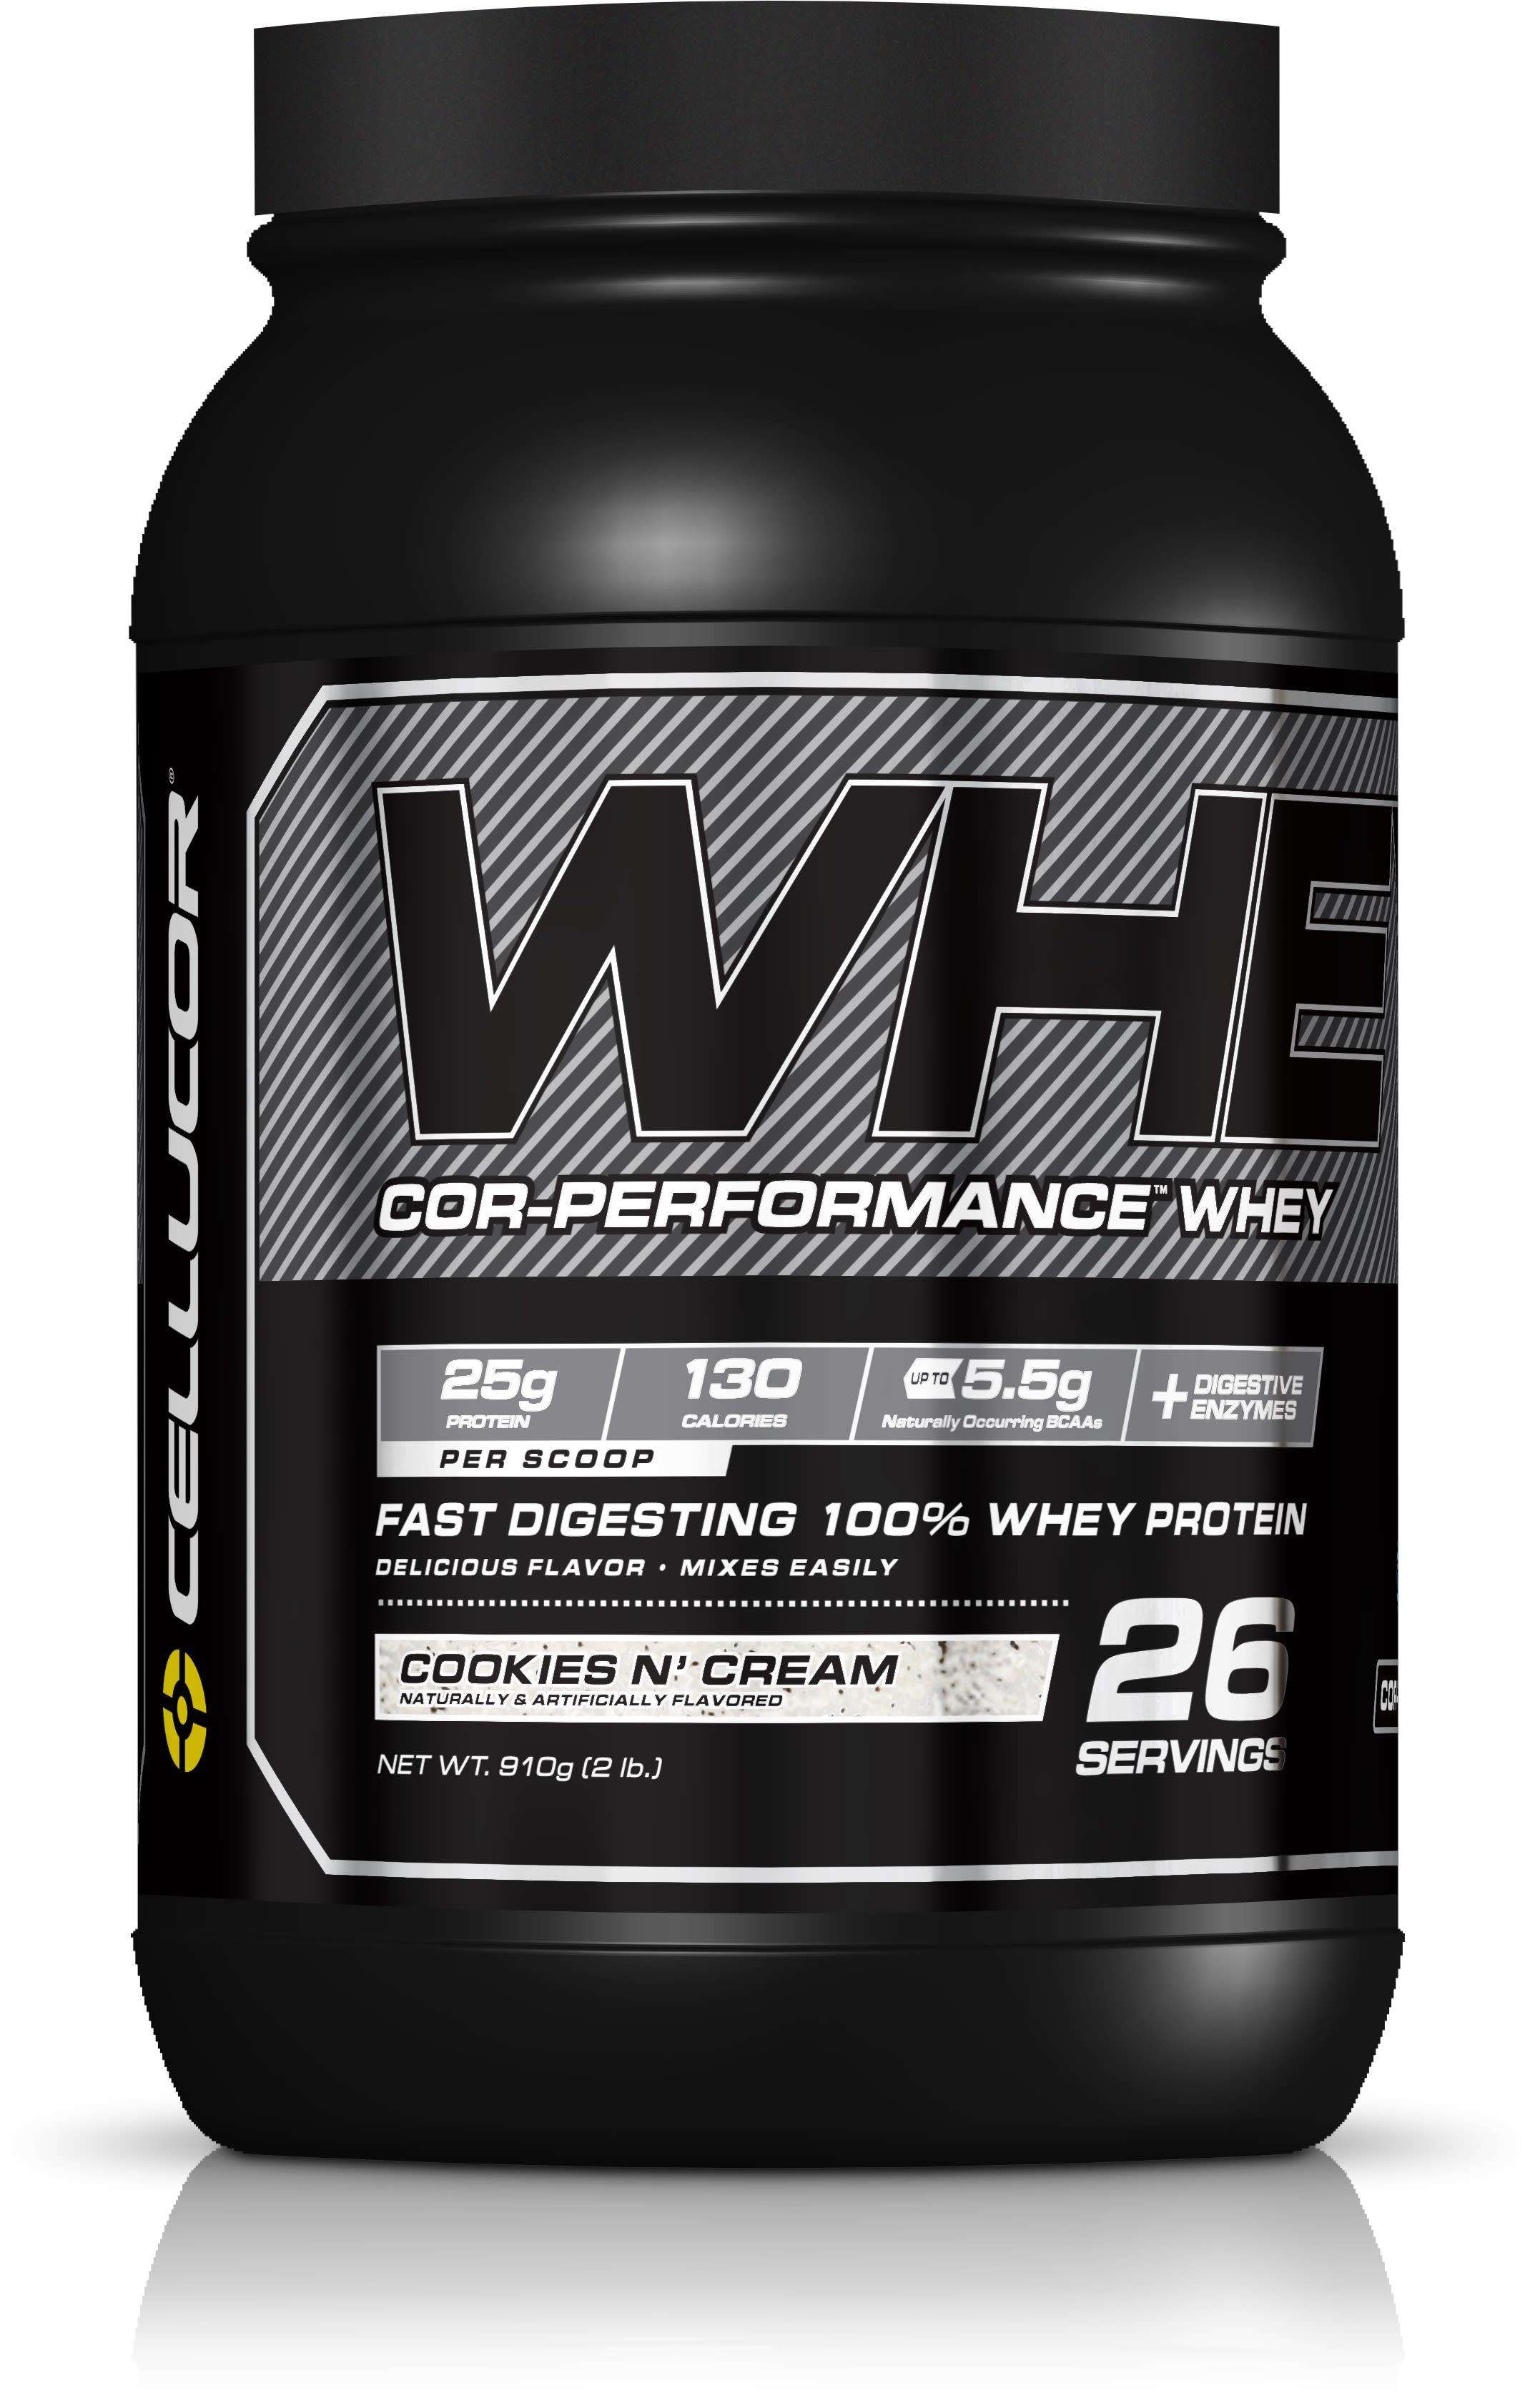 Cor Performance Whey - 26 Portionen - Zimtschnecke